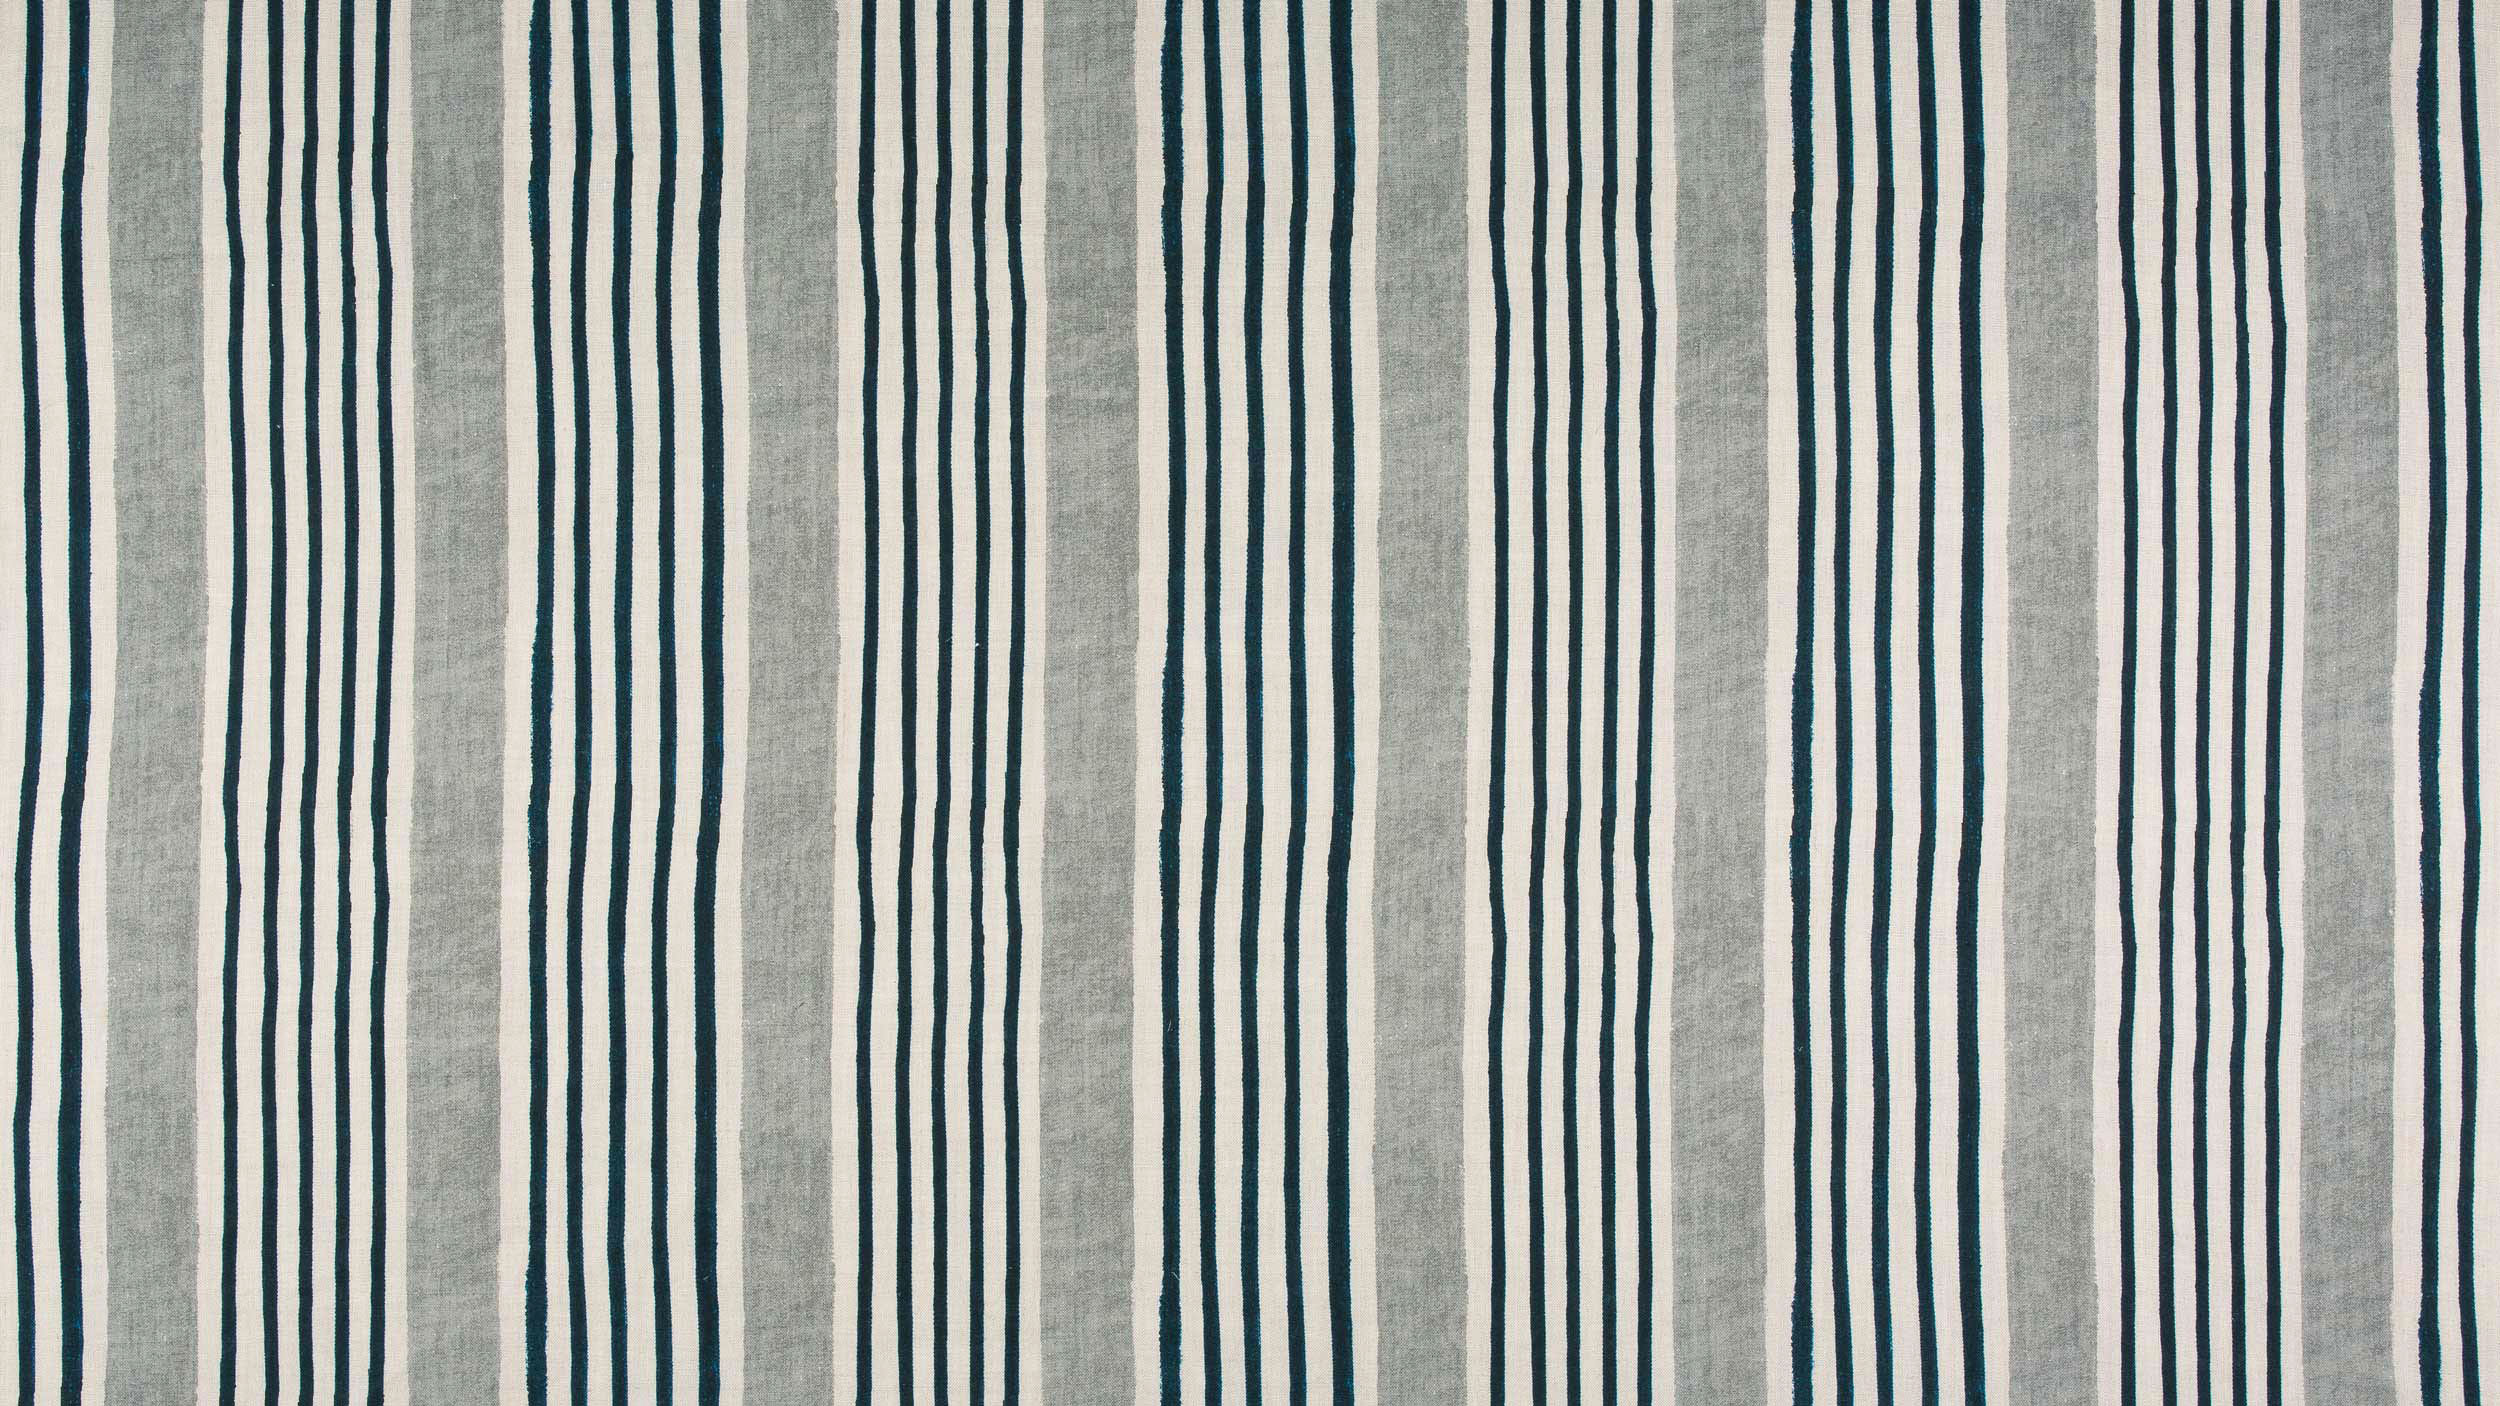 Clay_McLaurin_Studio_Andes-Stripe_Slate_web.jpg